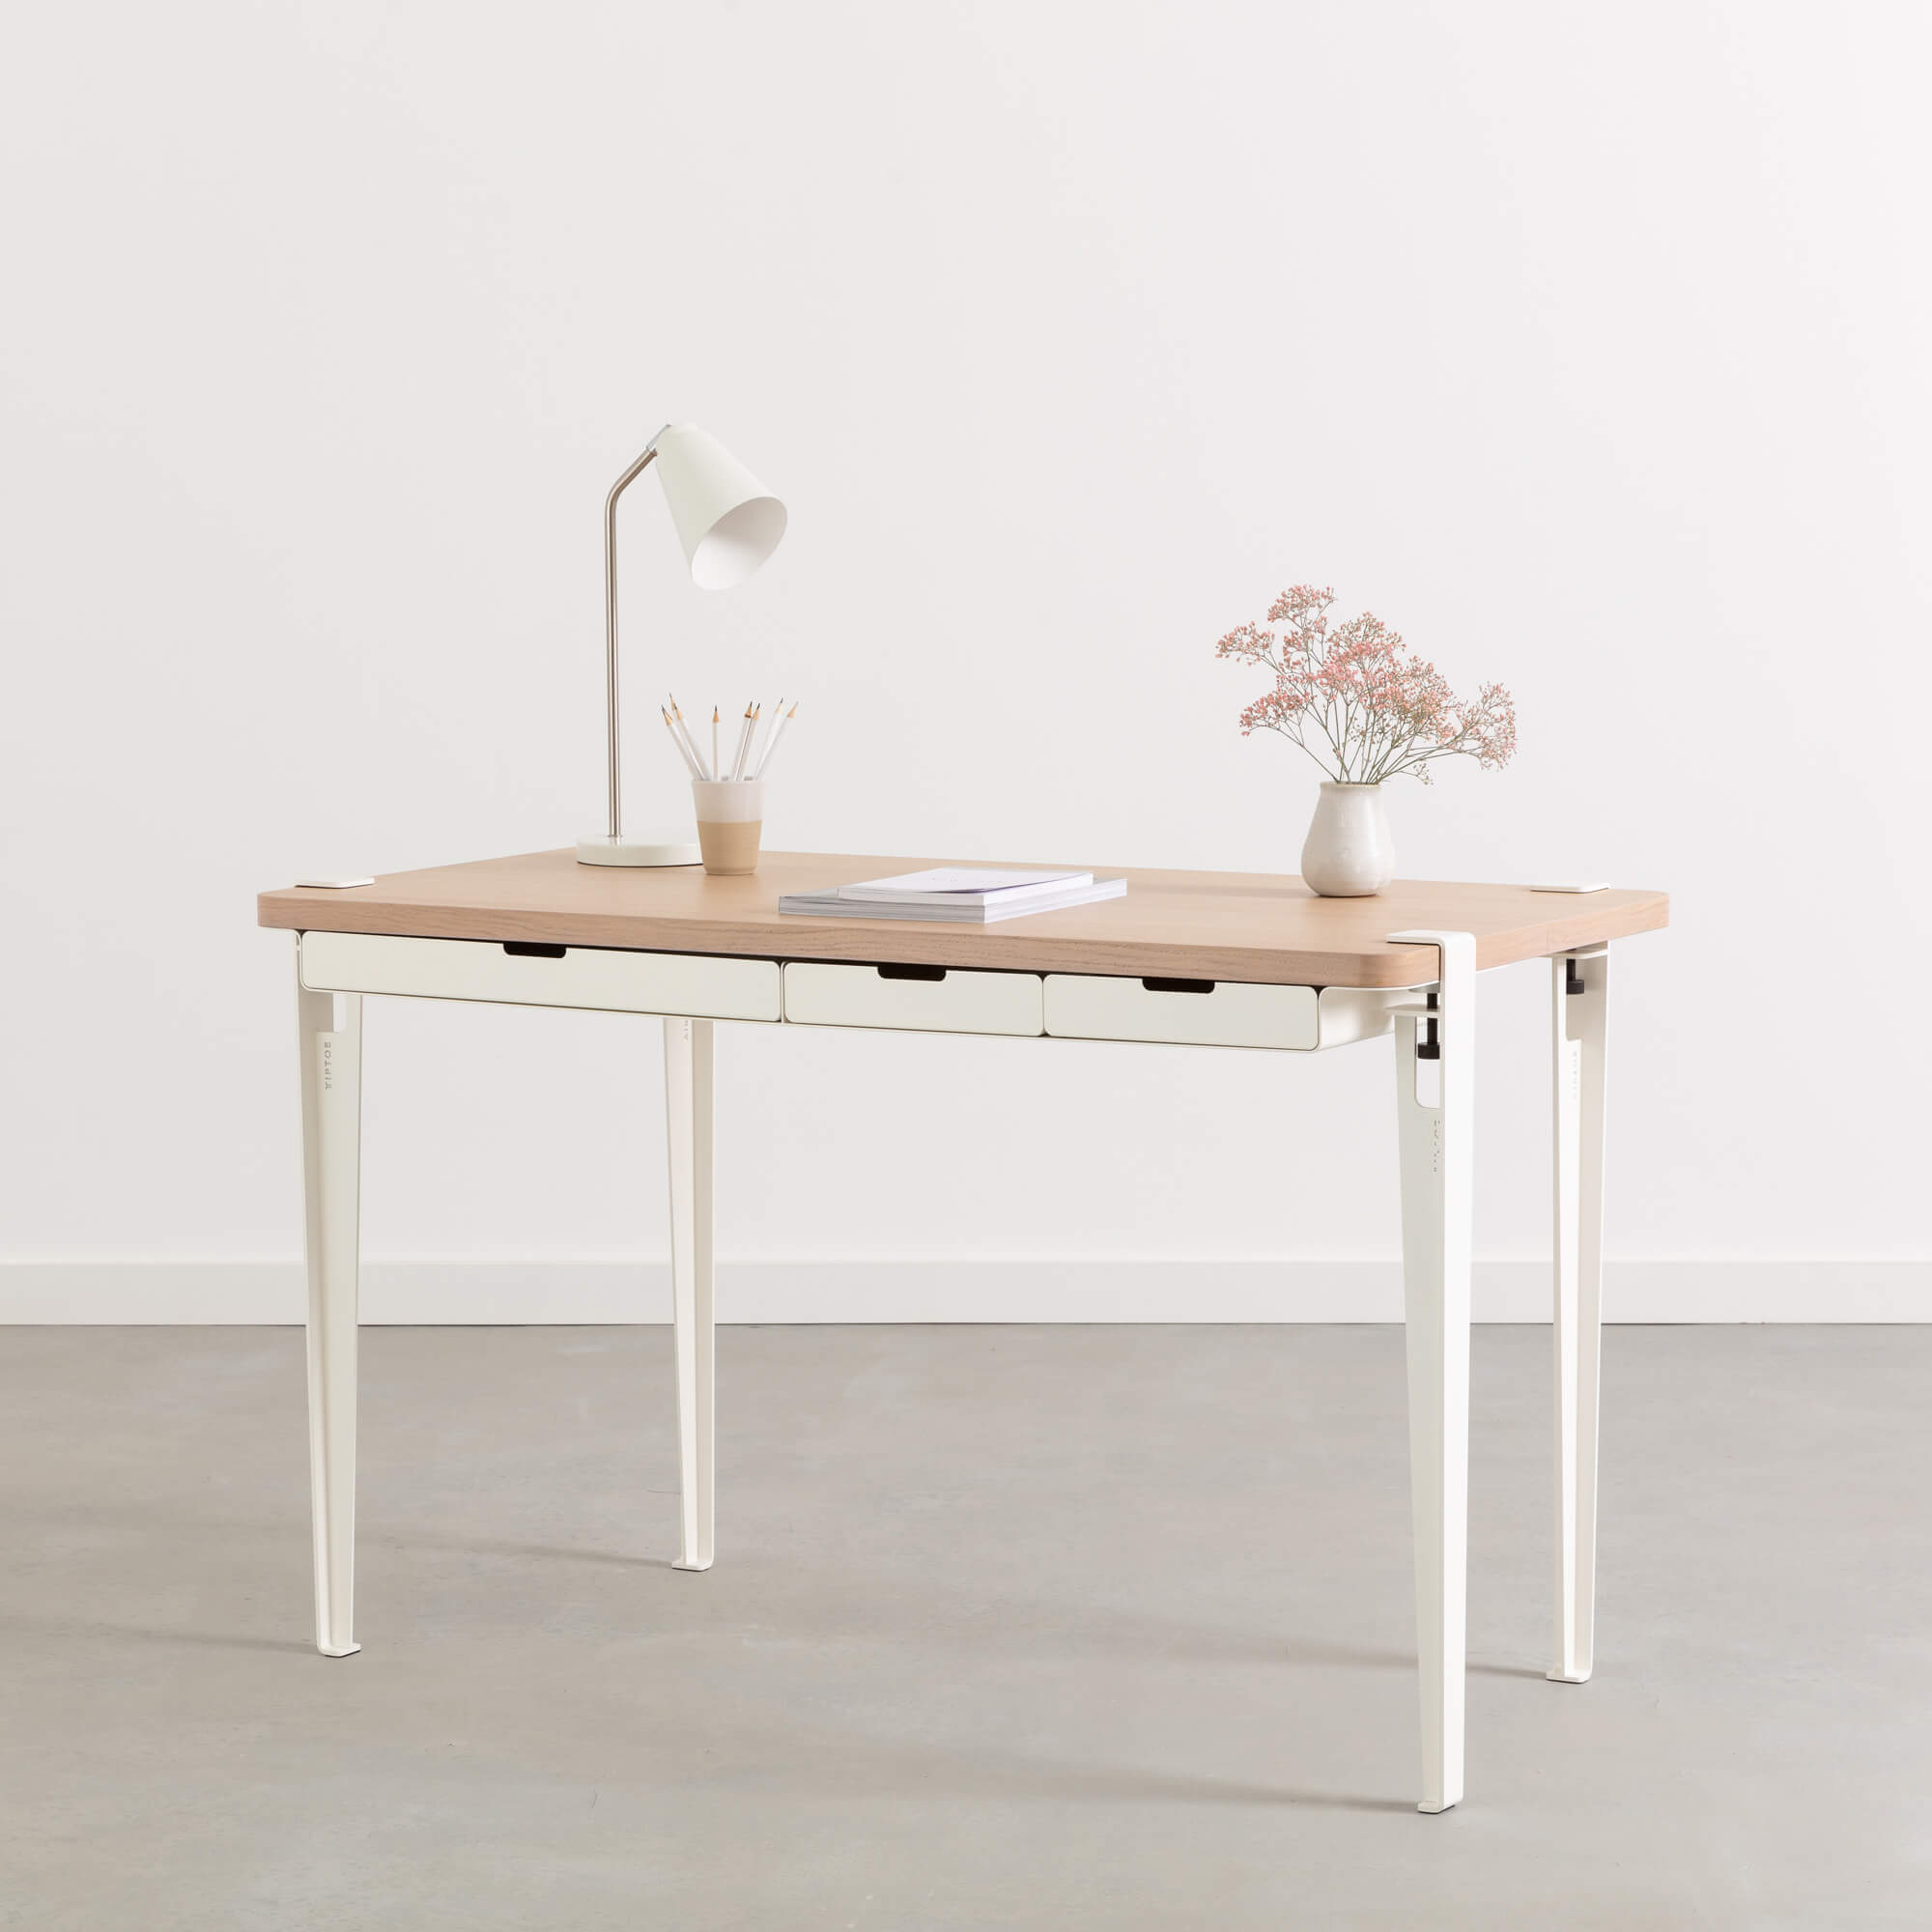 Shop MONOCHROME desk from TIPTOE on Openhaus